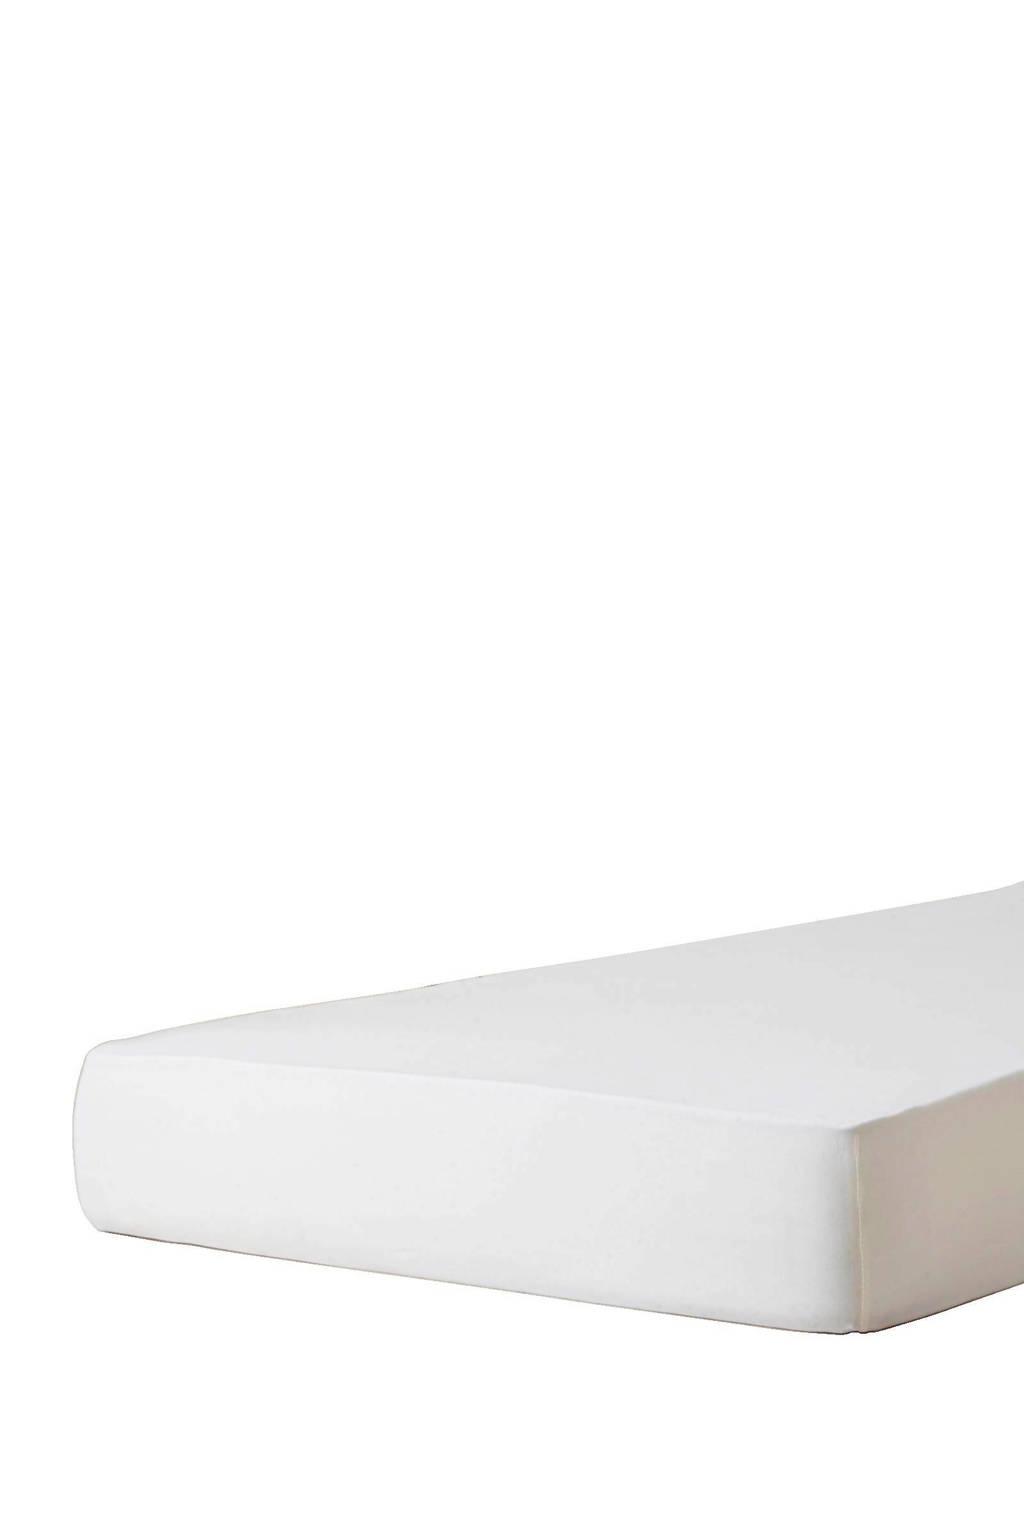 Beddinghouse jersey premium hoeslaken Ecru